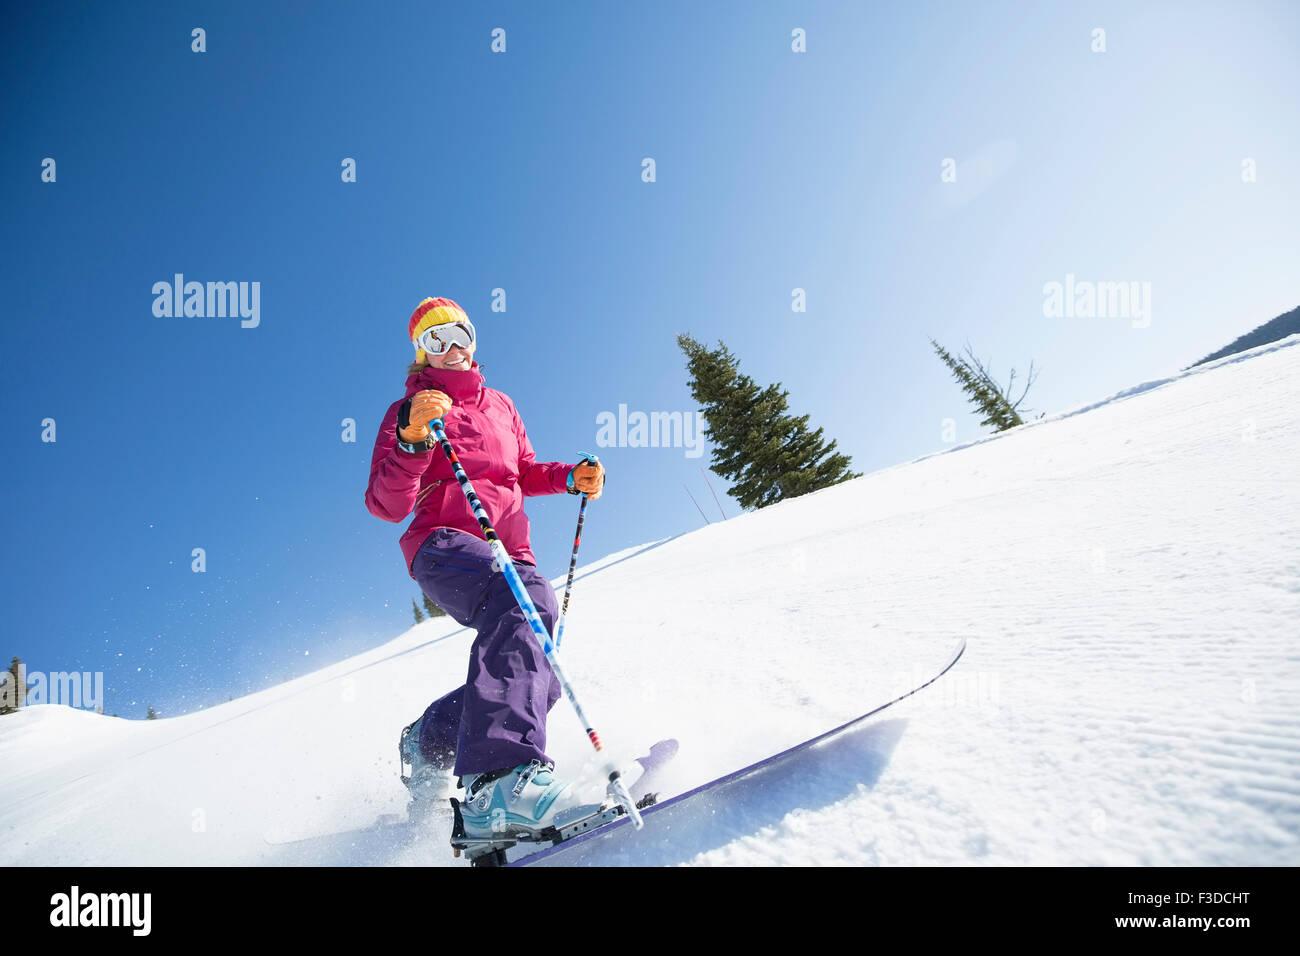 Woman skiing downhill - Stock Image